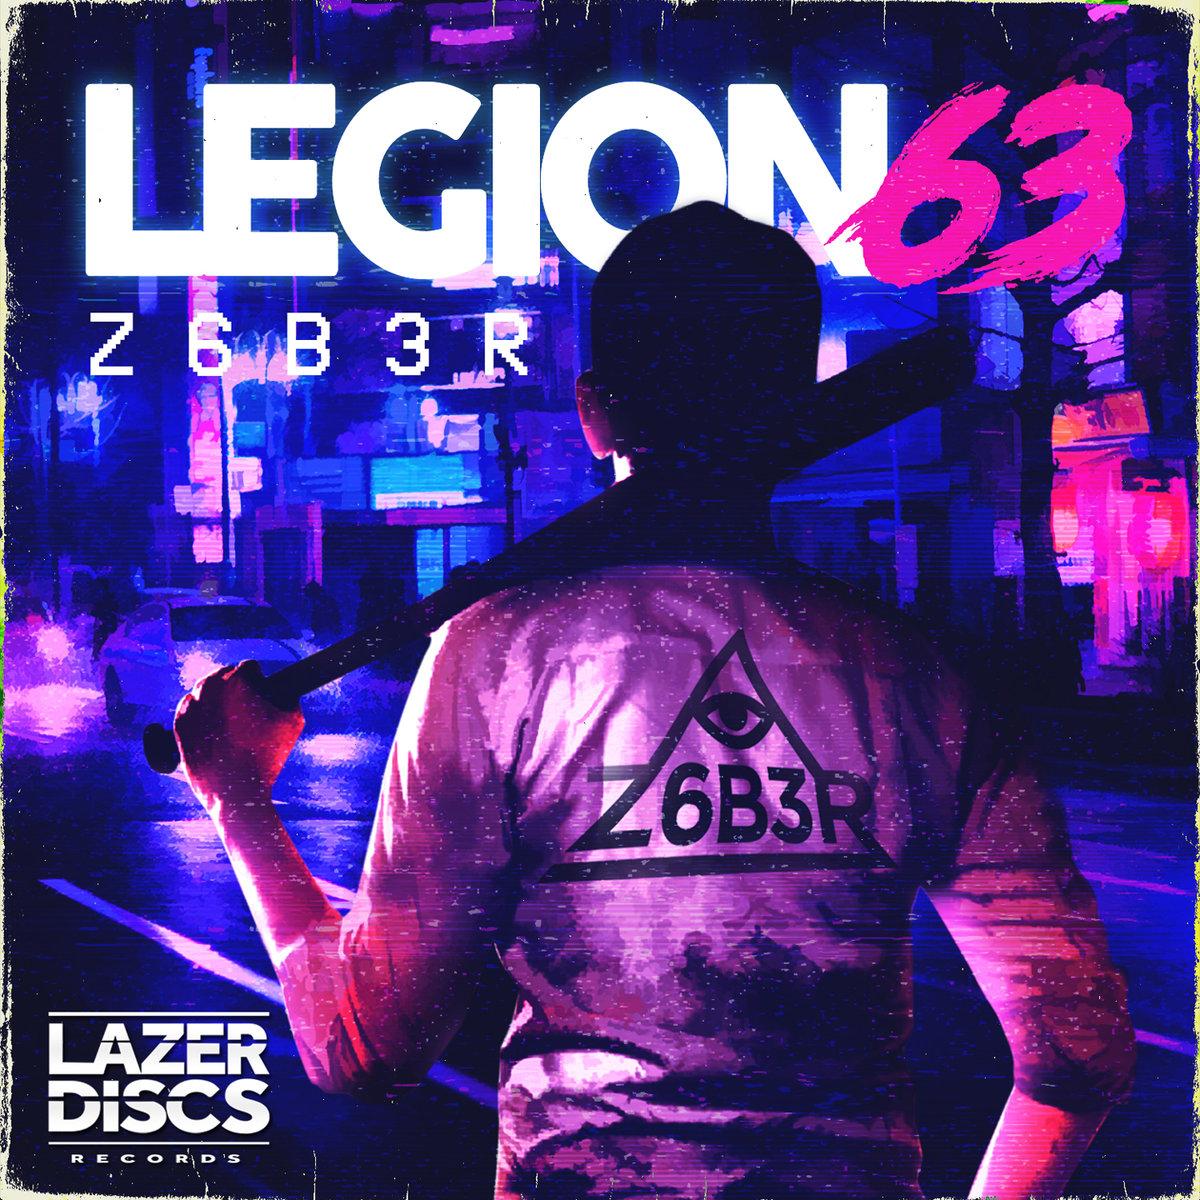 【音乐分享】SYNTHWAVE合成器浪潮篇——Legion 63